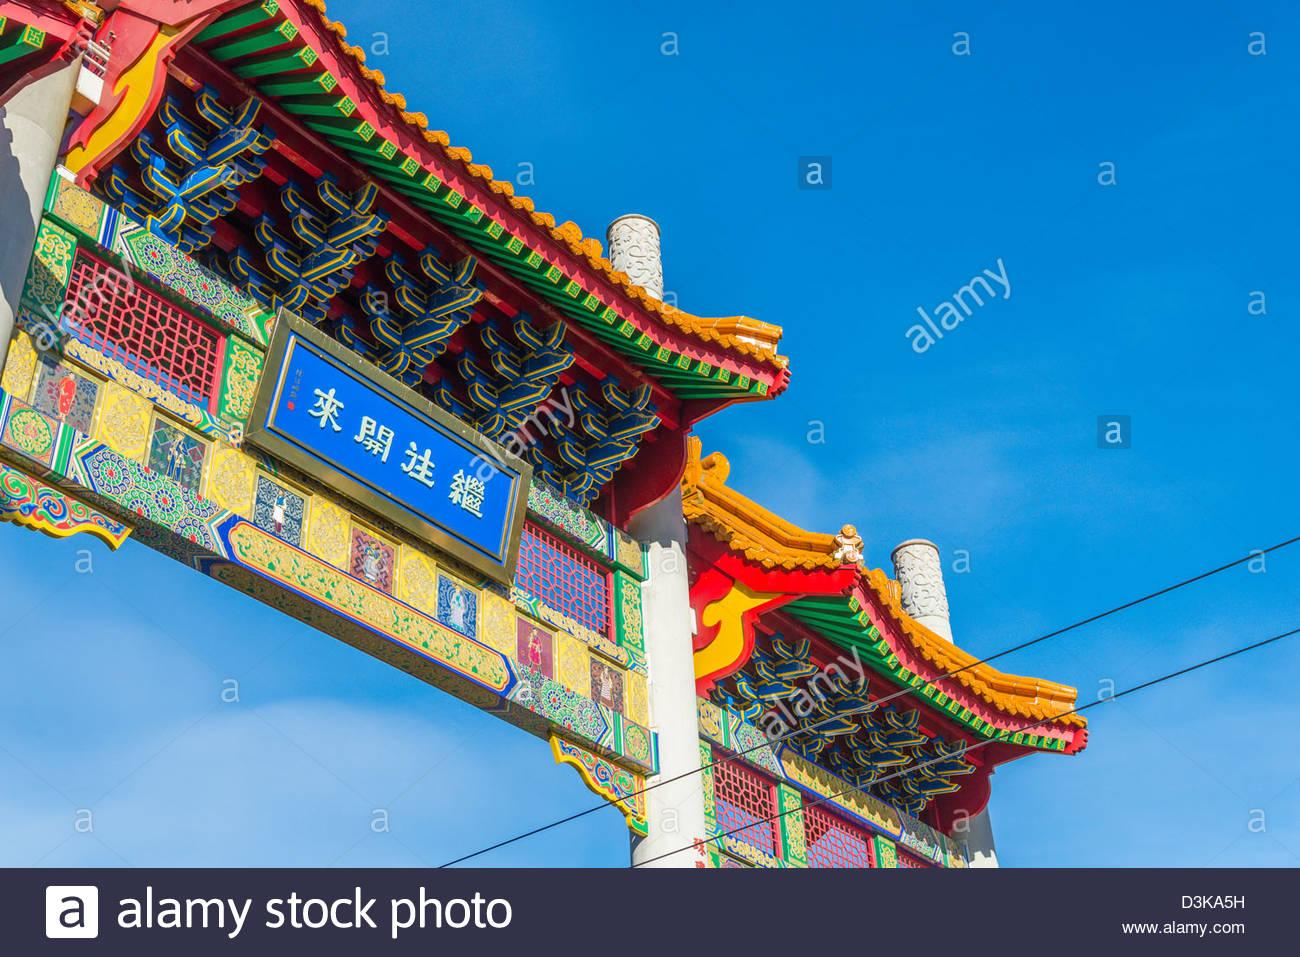 El Milenio Chinatown Gate, West Pender Street, Vancouver, British Columbia, Canadá Imagen De Stock